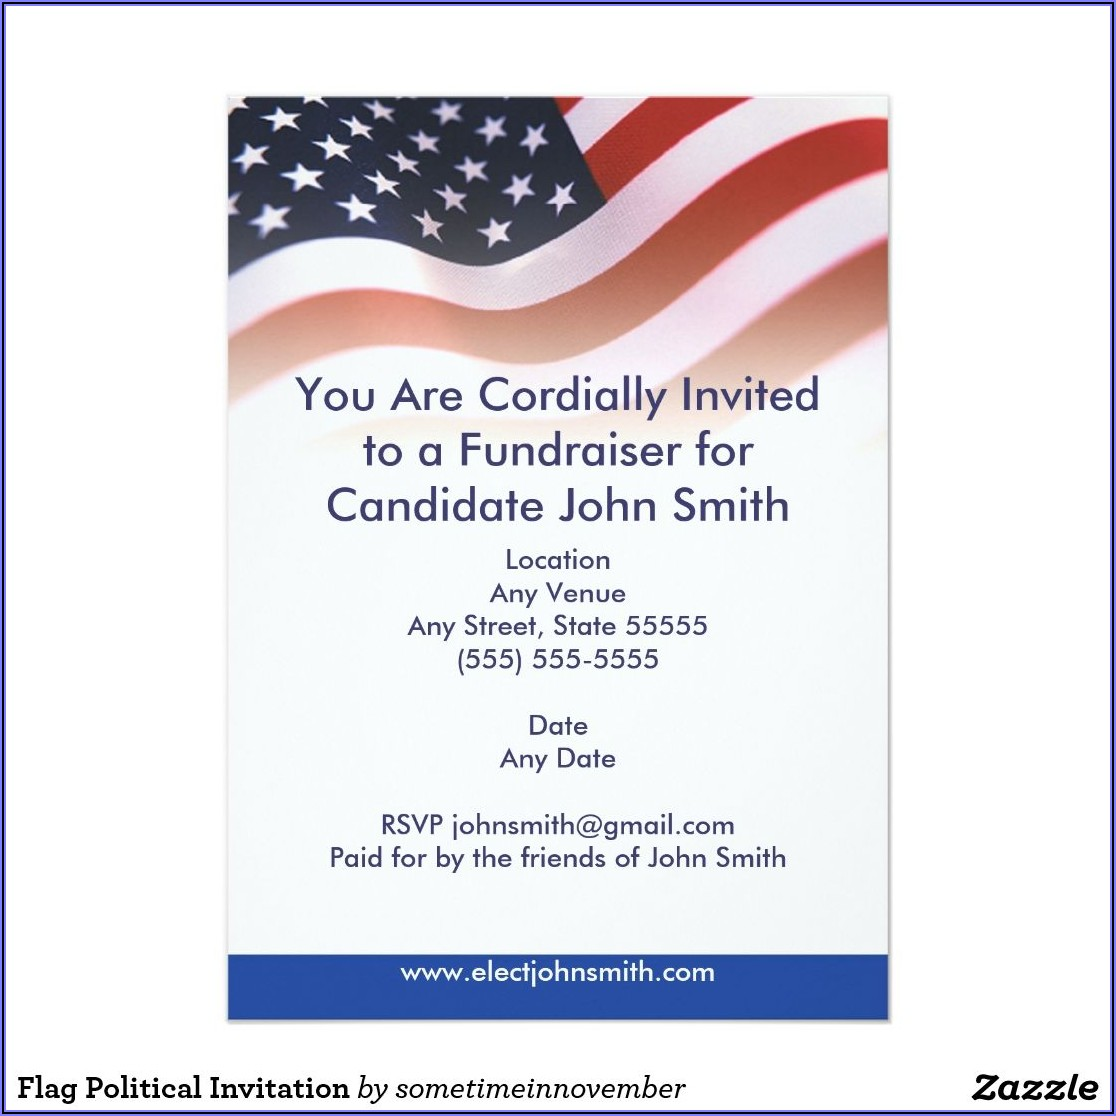 Fundraising Event Fundraiser Invitation Wording